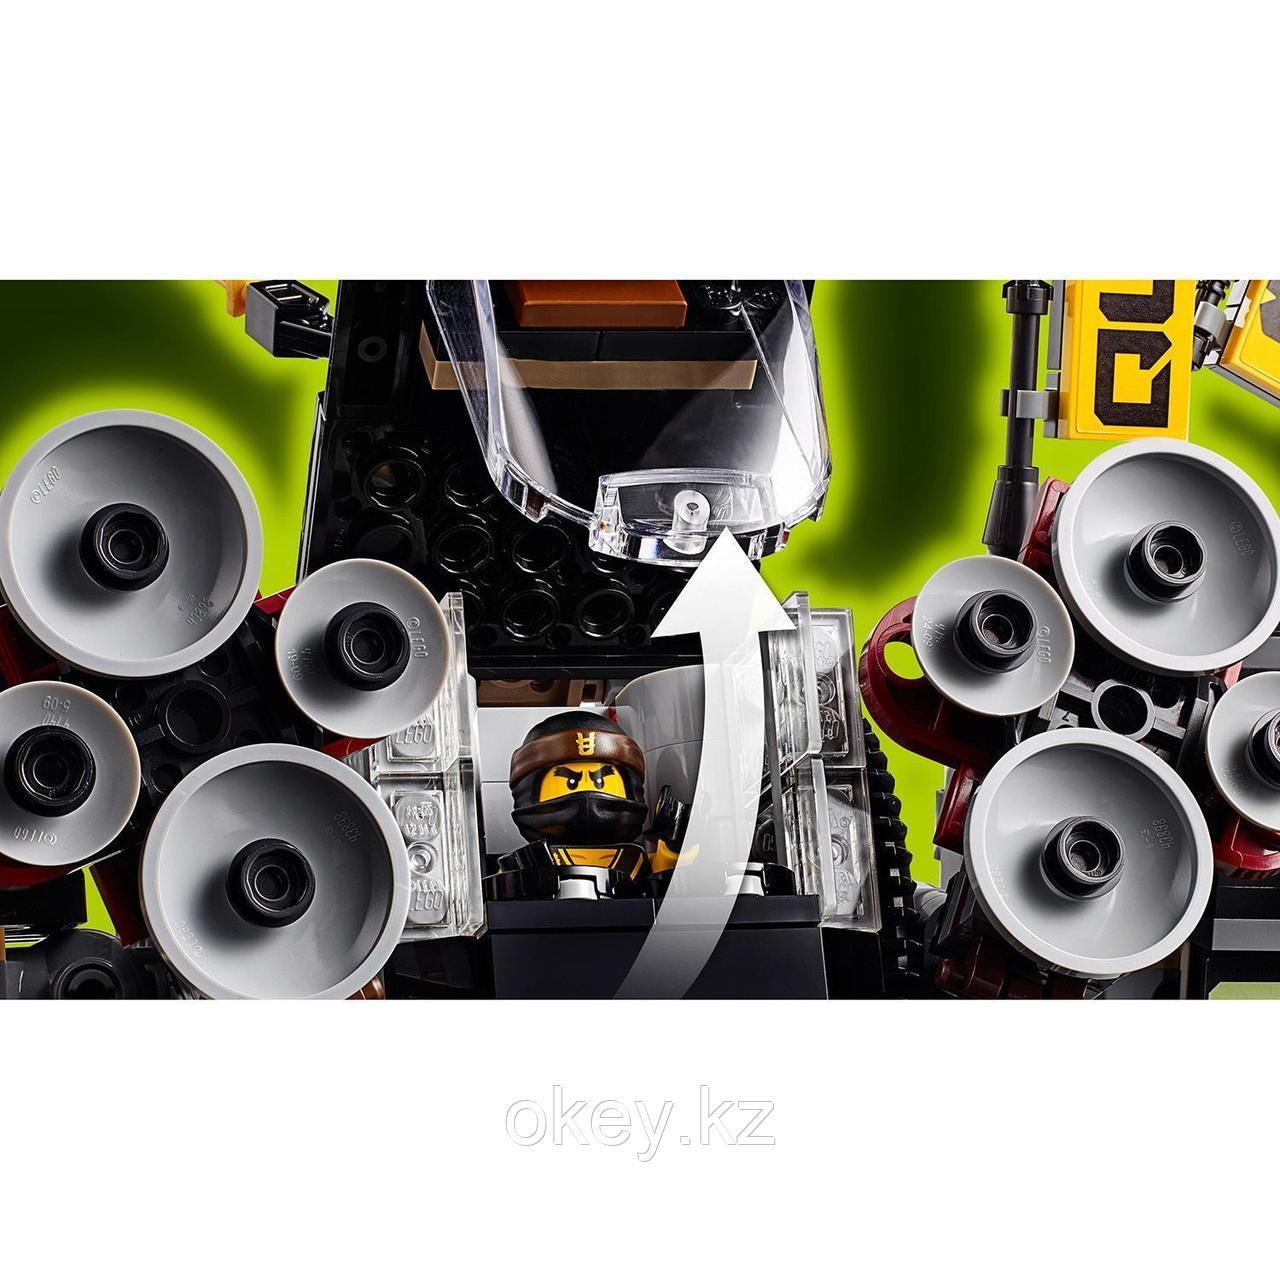 LEGO Ninjago Movie: Робот землетрясений 70632 - фото 6